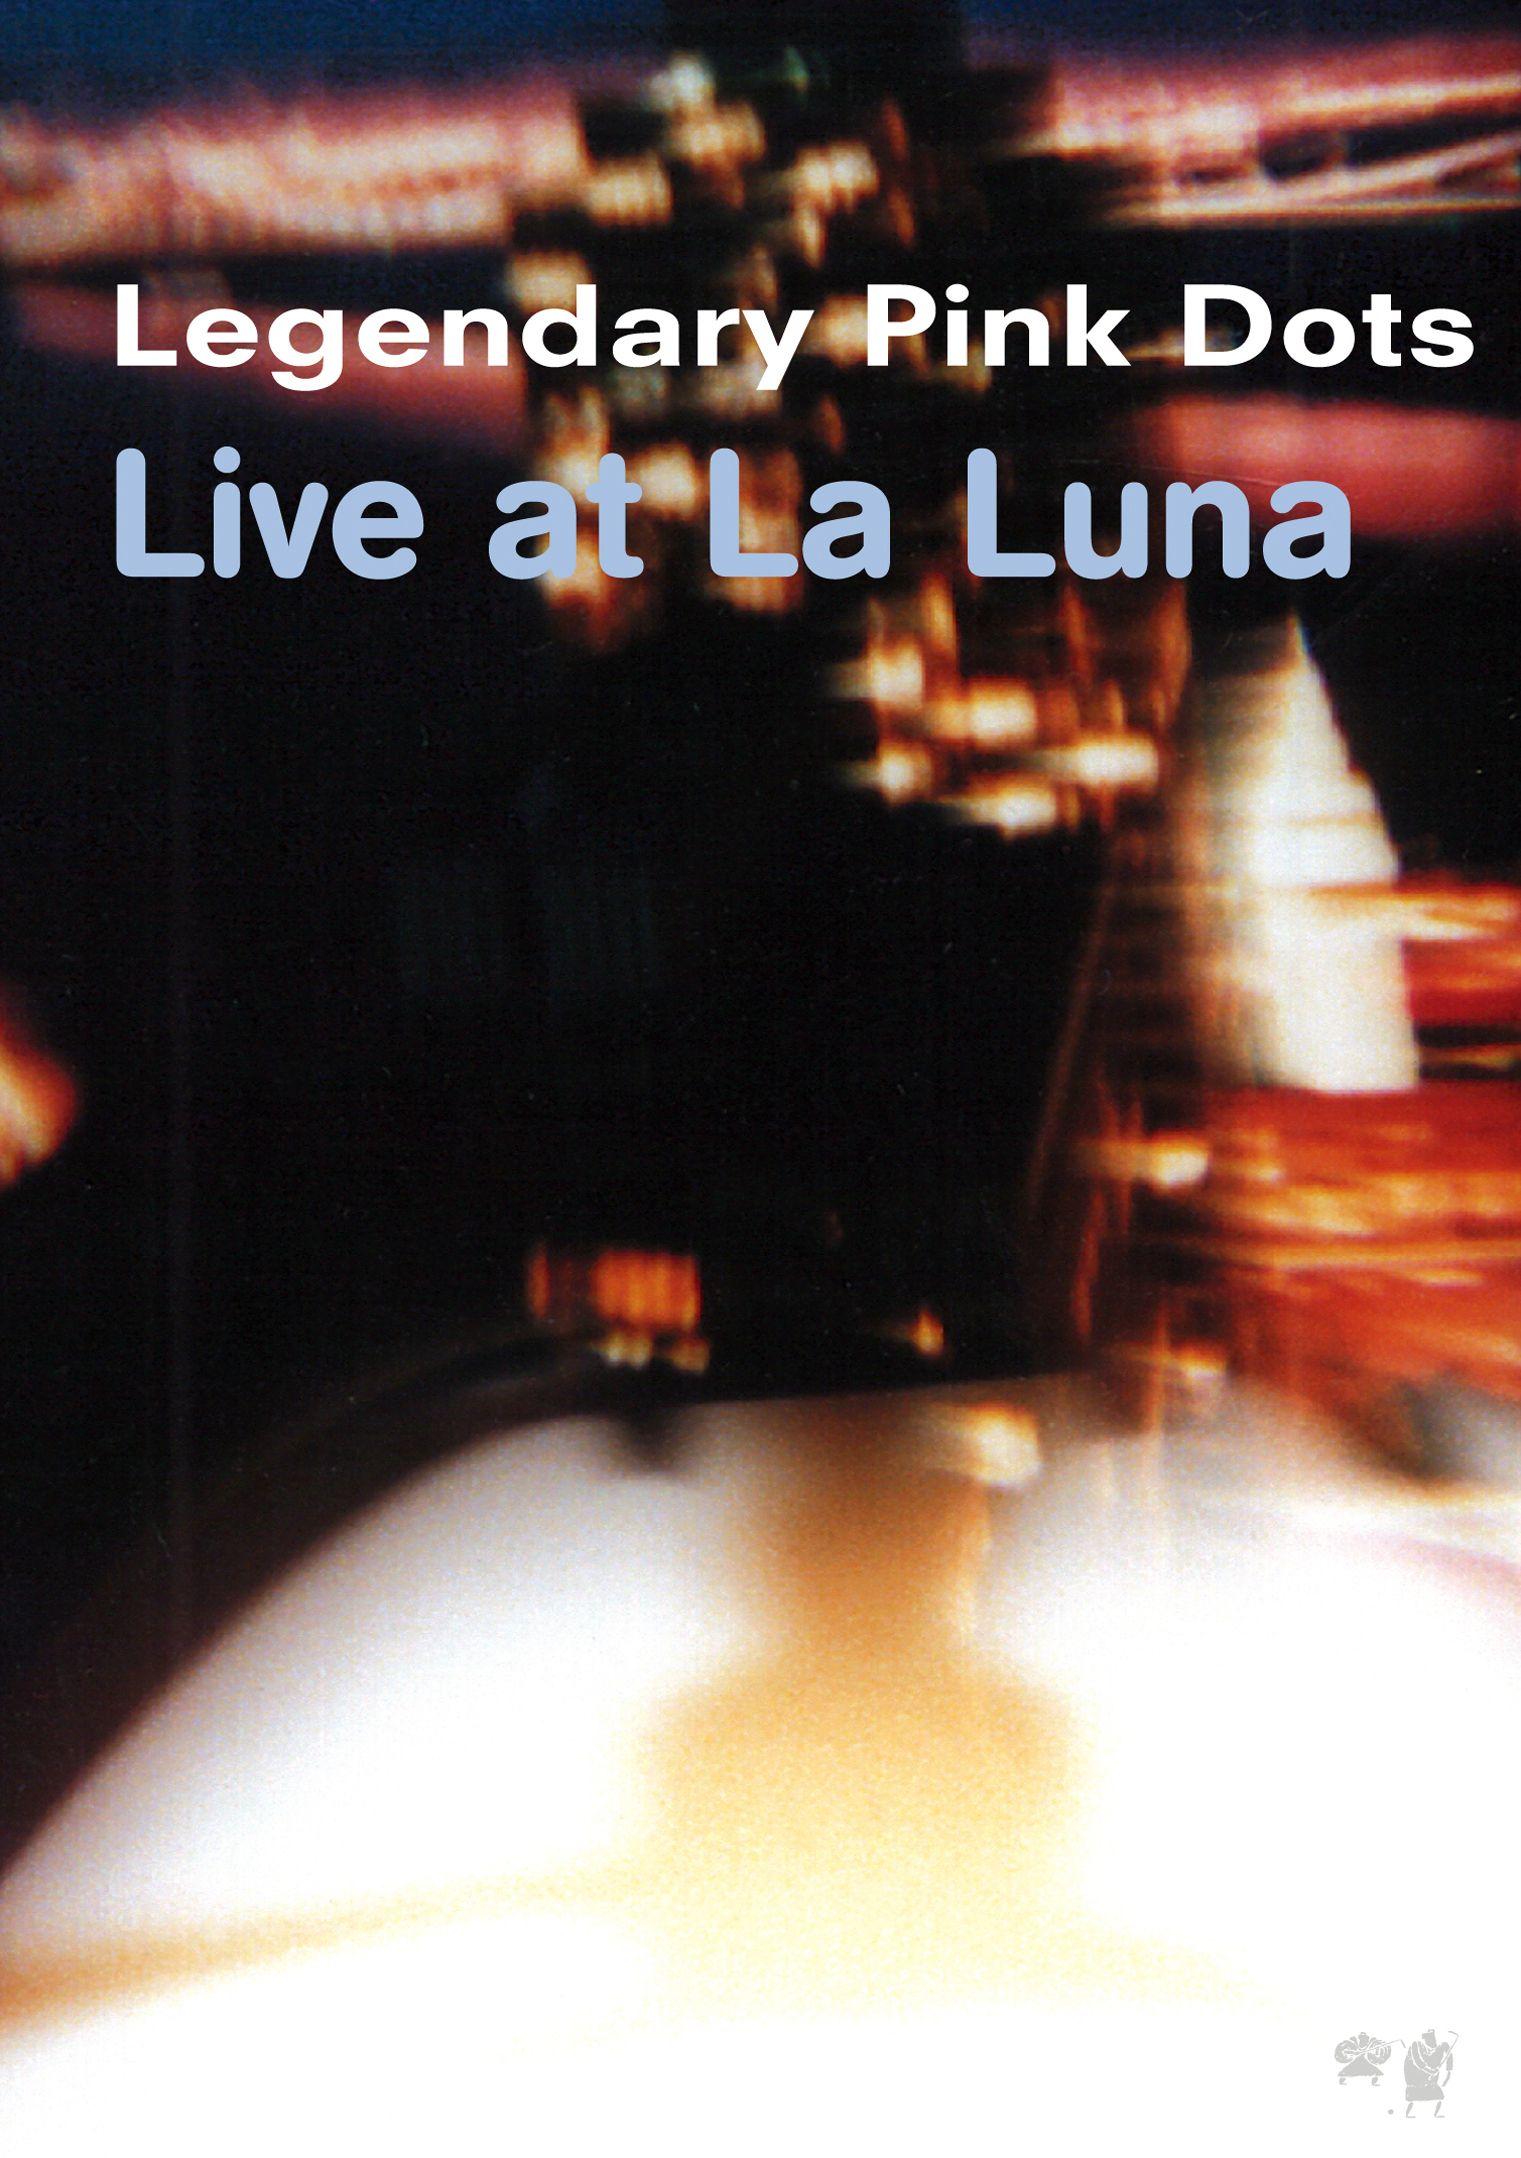 Legendary Pink Dots: A Dream Is a Dream